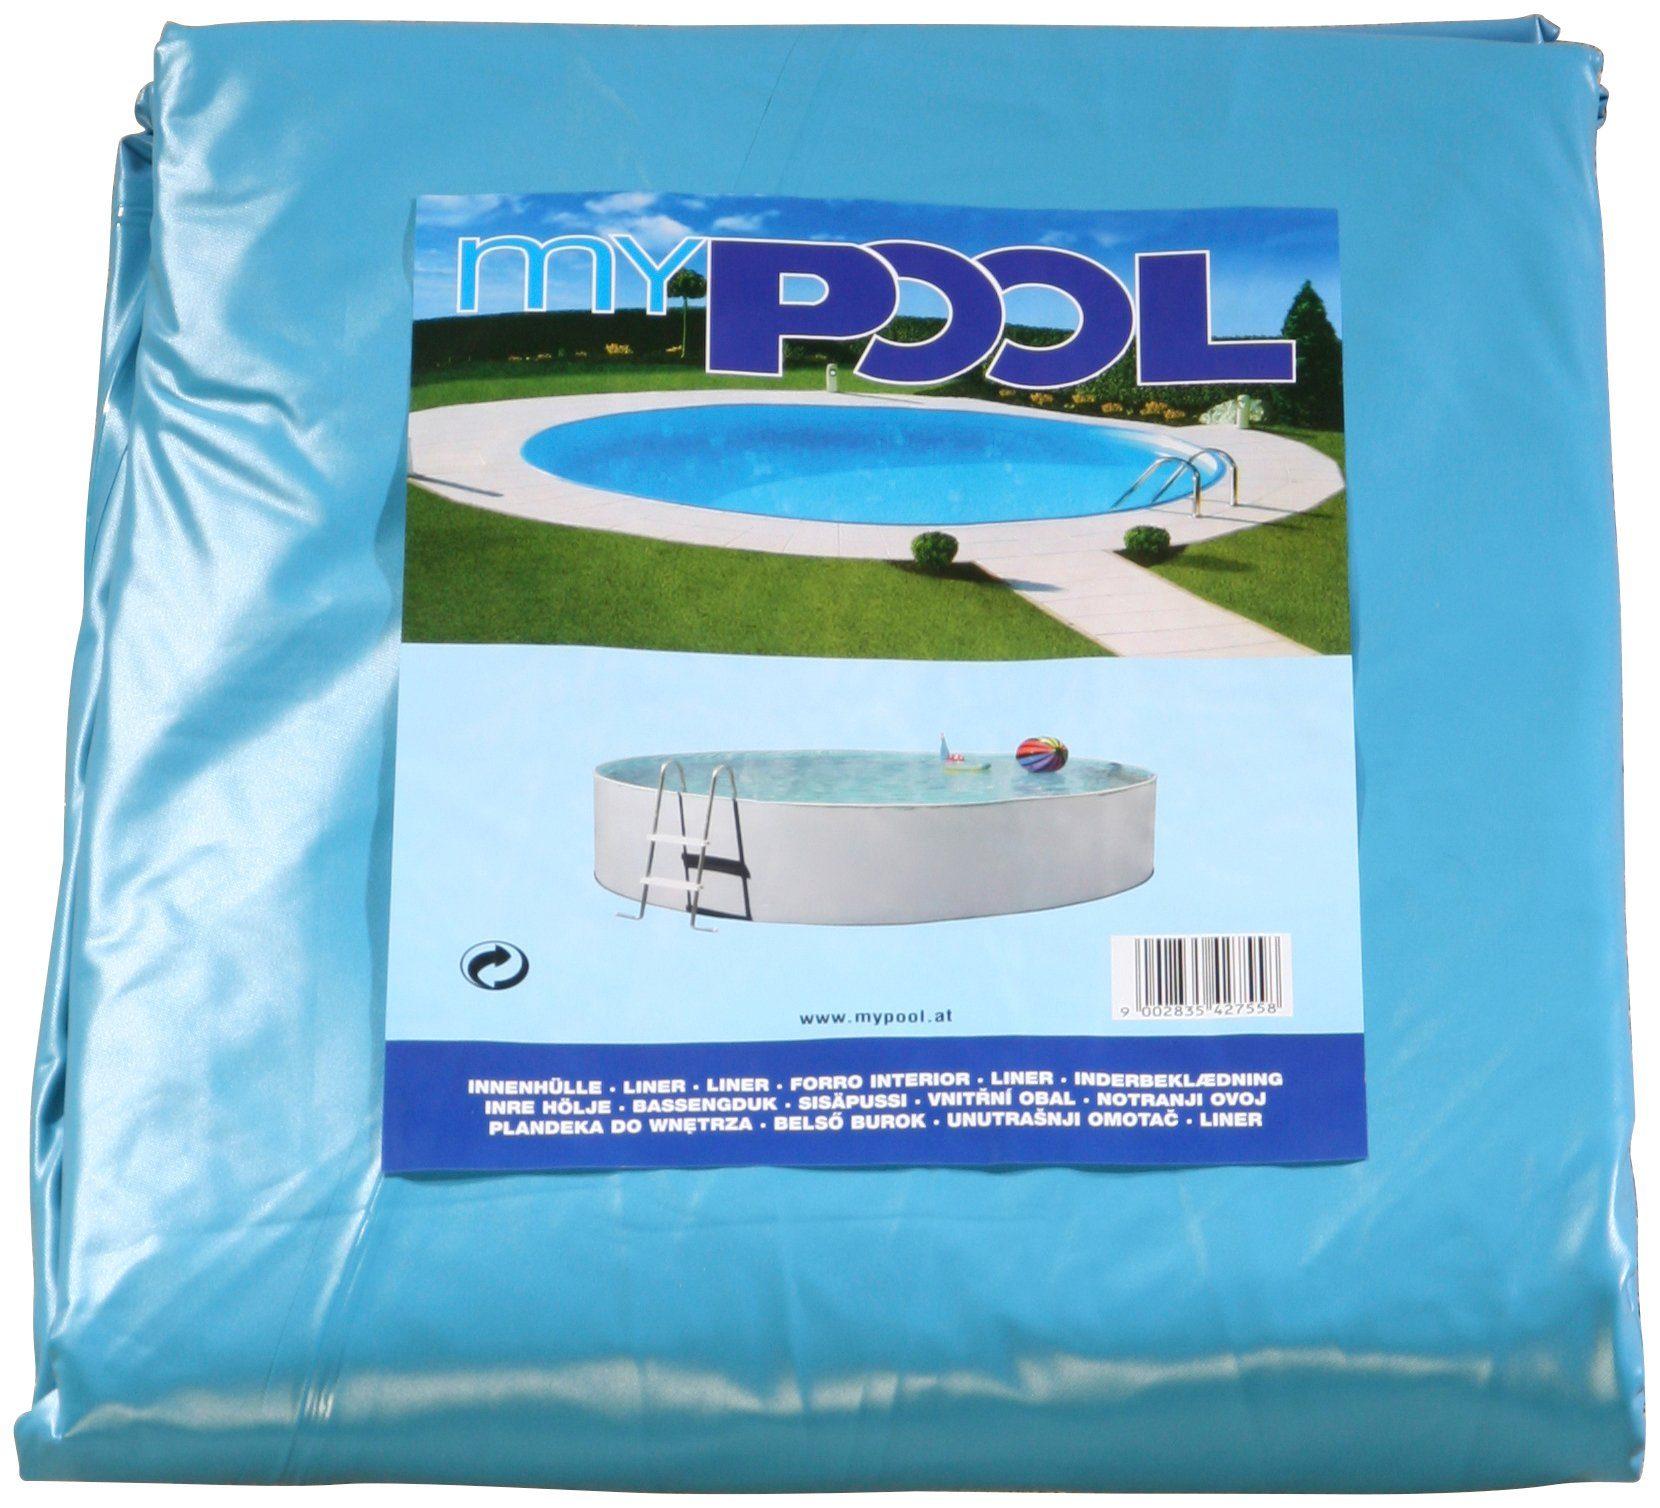 MYPOOL Pool-Innenhülle , für ØxH: 350x90 cm, 0,4 mm, blau